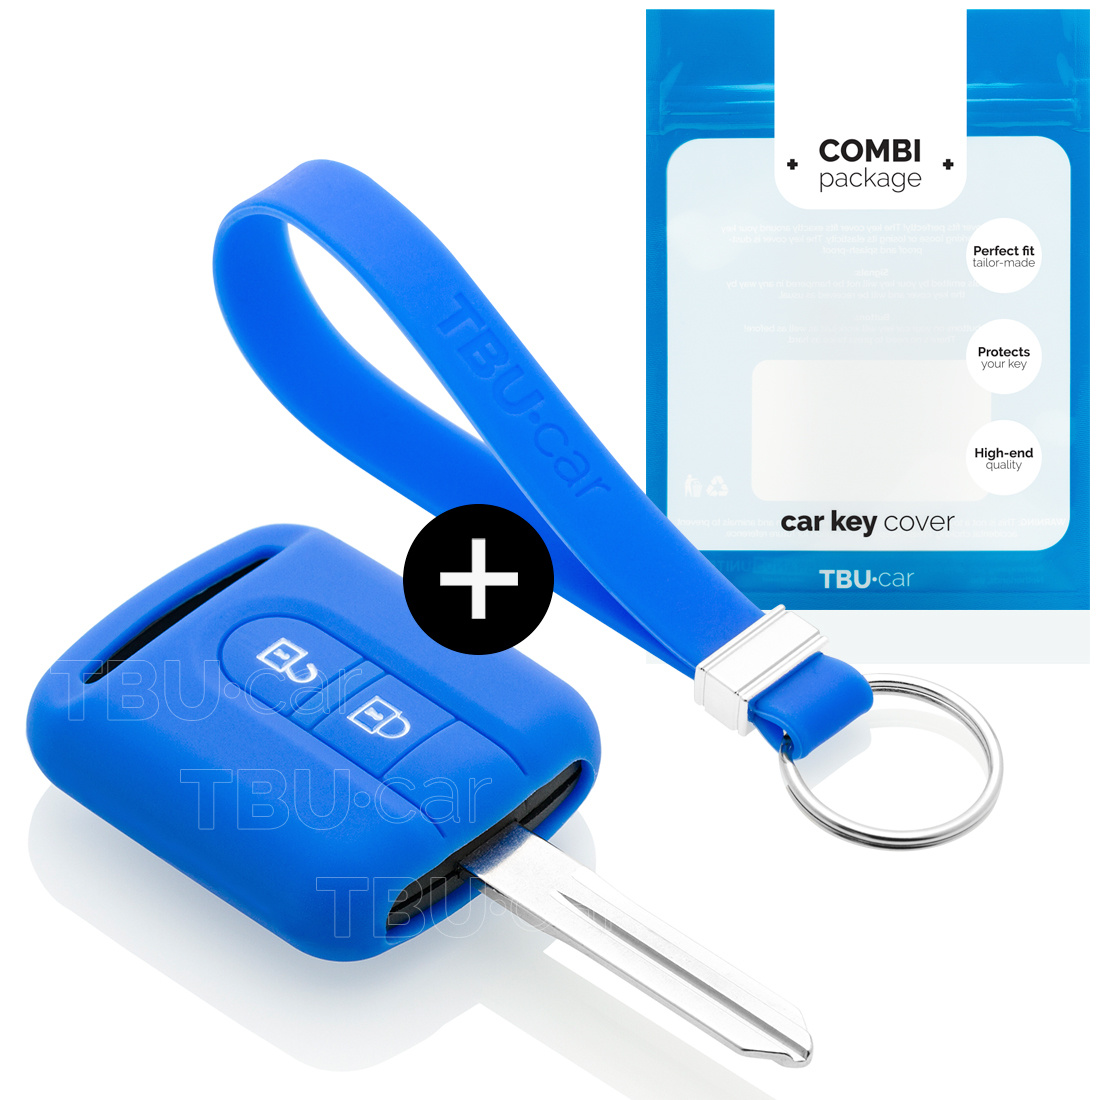 TBU·CAR Nissan Autoschlüssel Hülle - Silikon Schutzhülle - Schlüsselhülle Cover - Blau